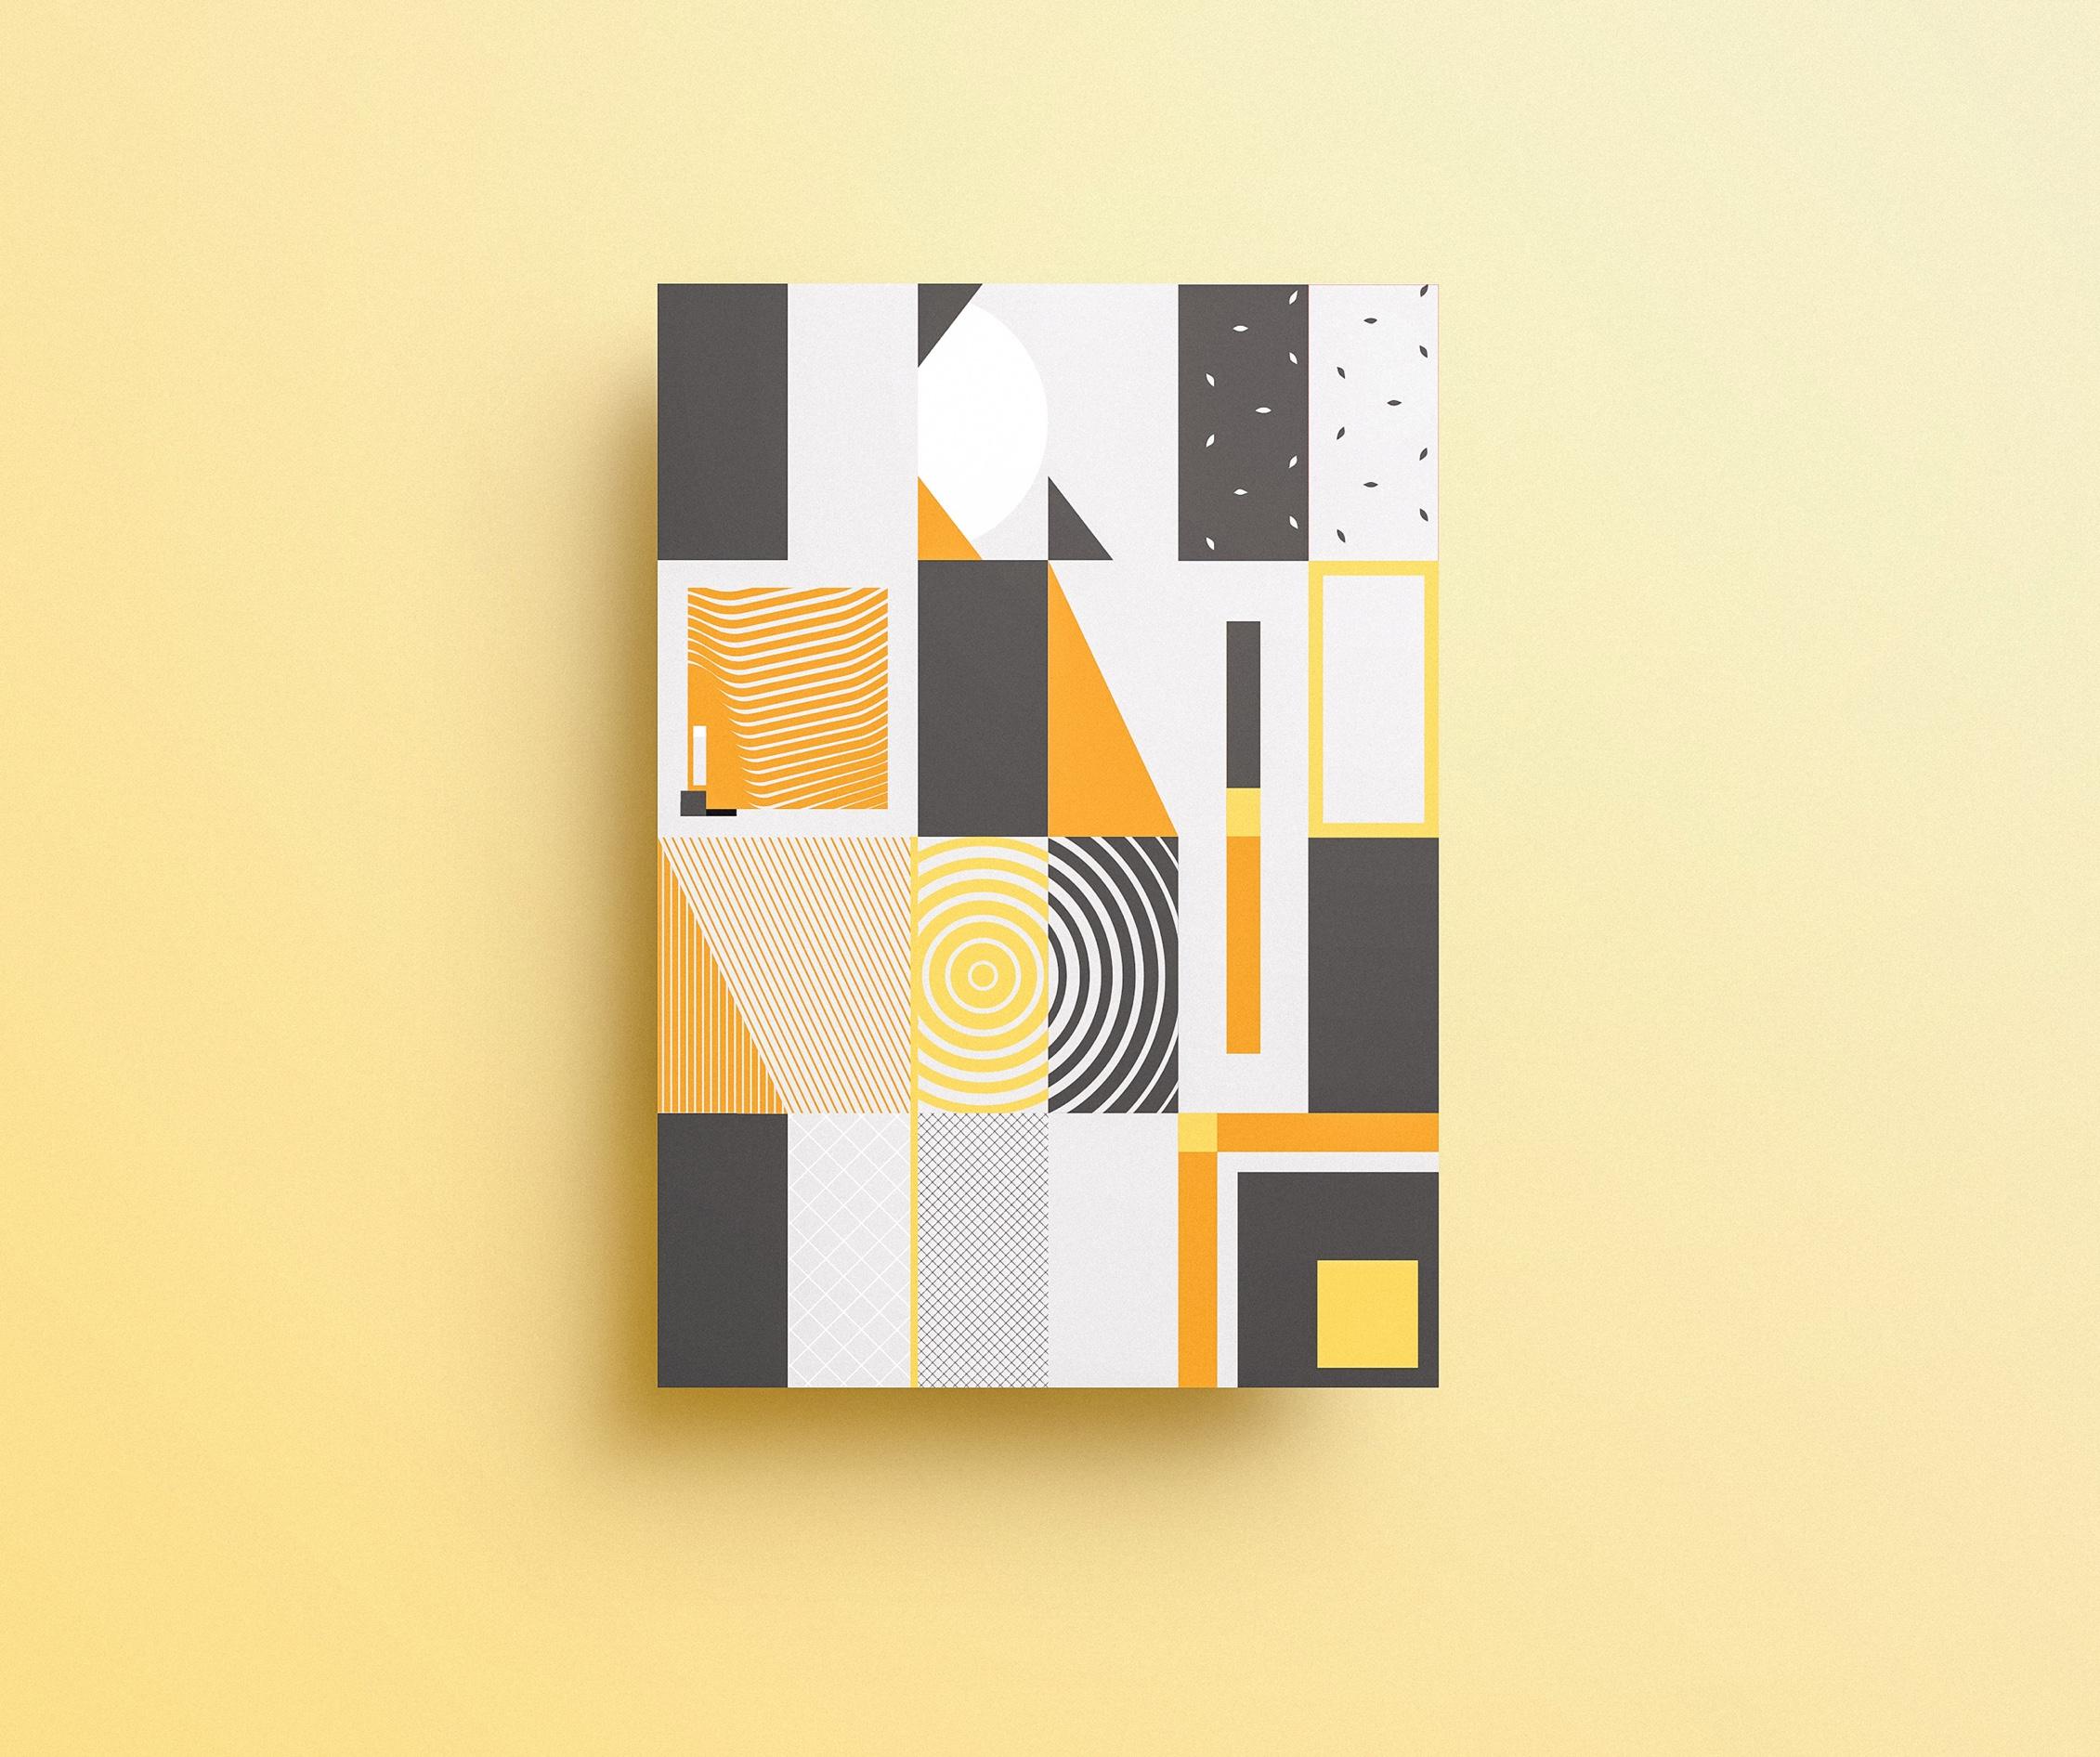 30 Days of Shapes —Illustration